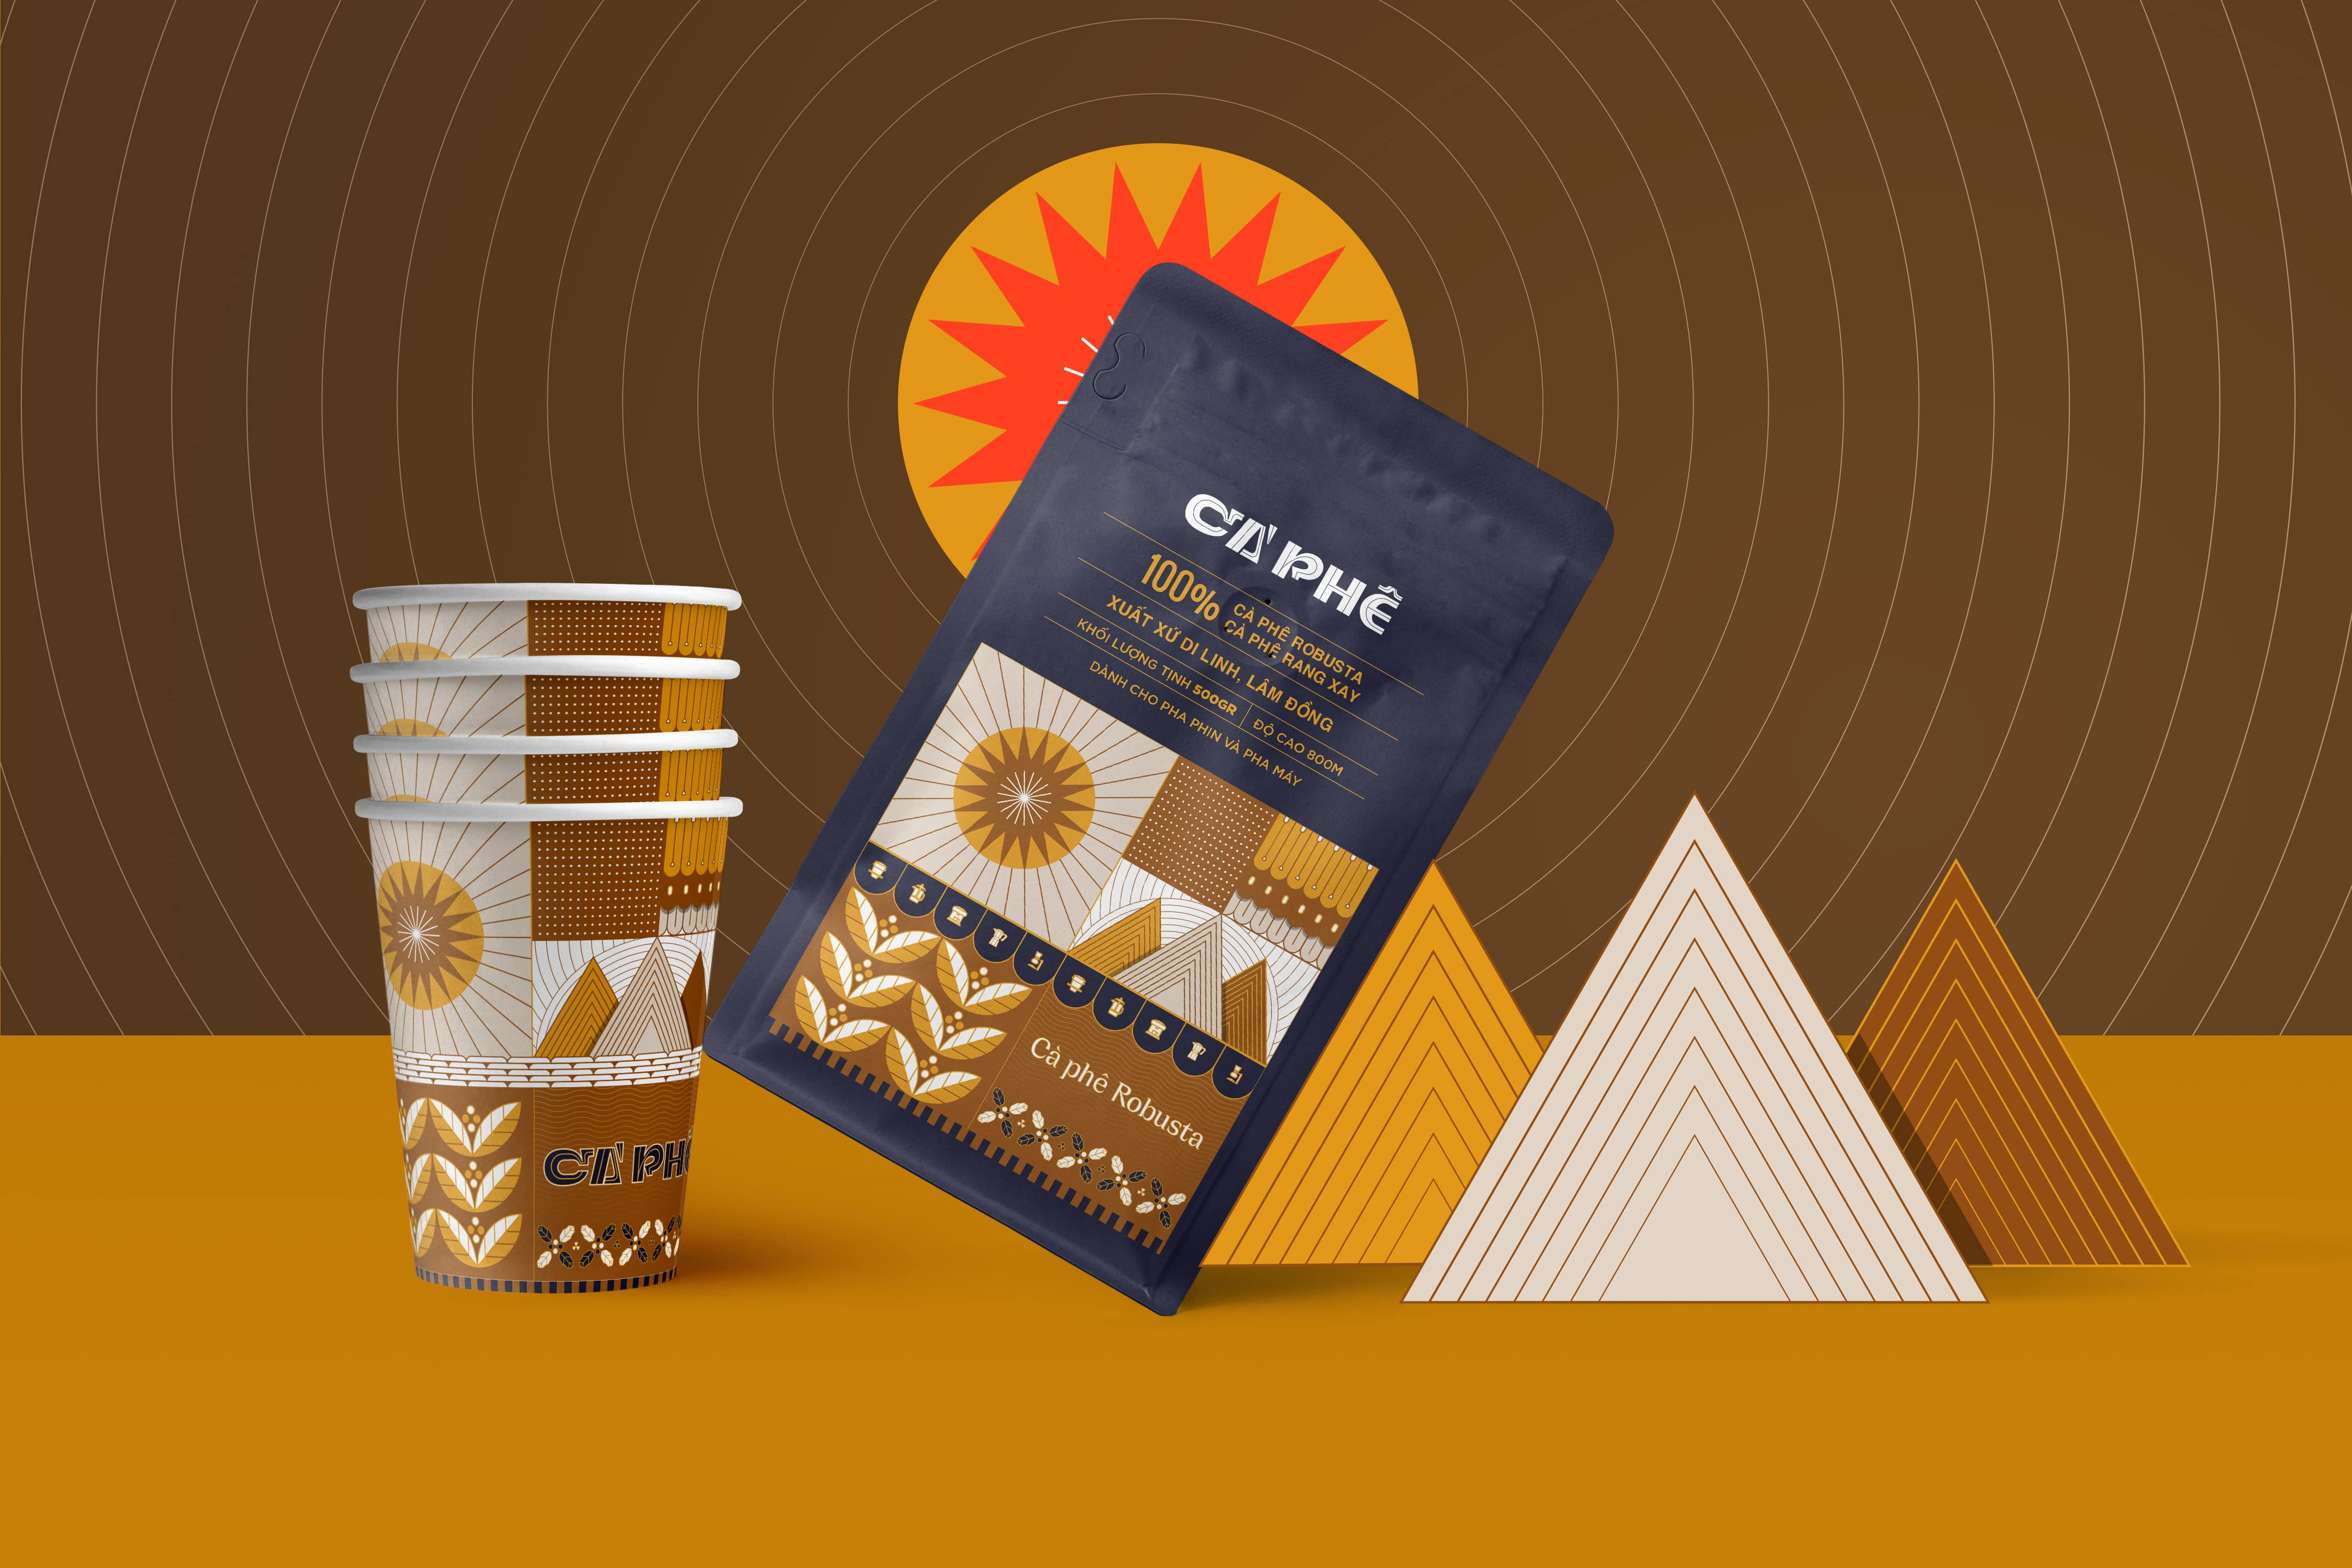 Packaging Design of Cao Nguyen Nang Chay Coffee Range by Vu Pham